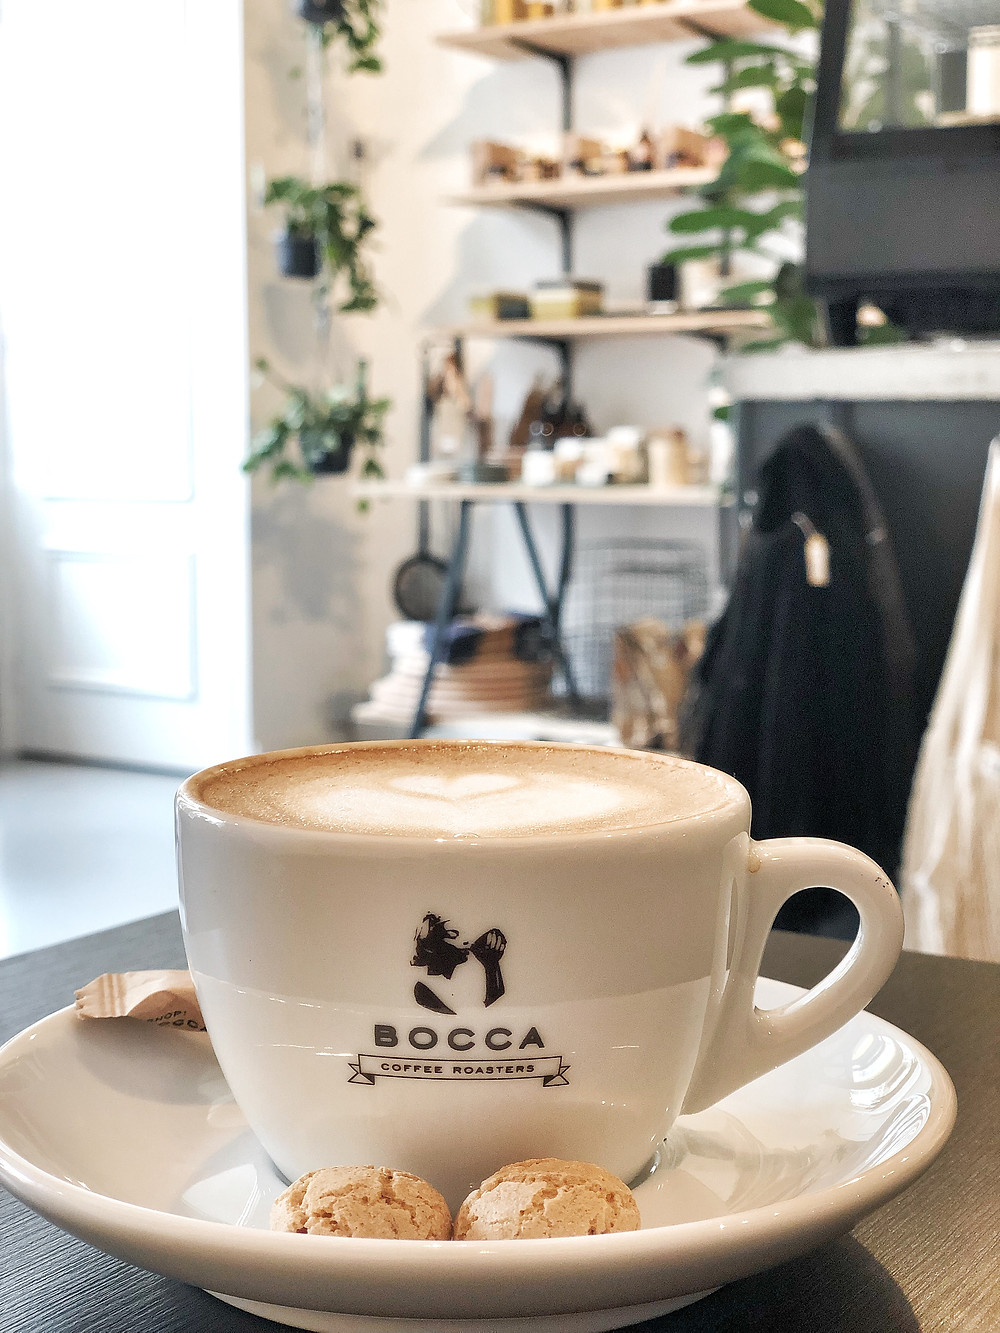 Bocca Coffee at Nørd Concept Store, Leeuwarden